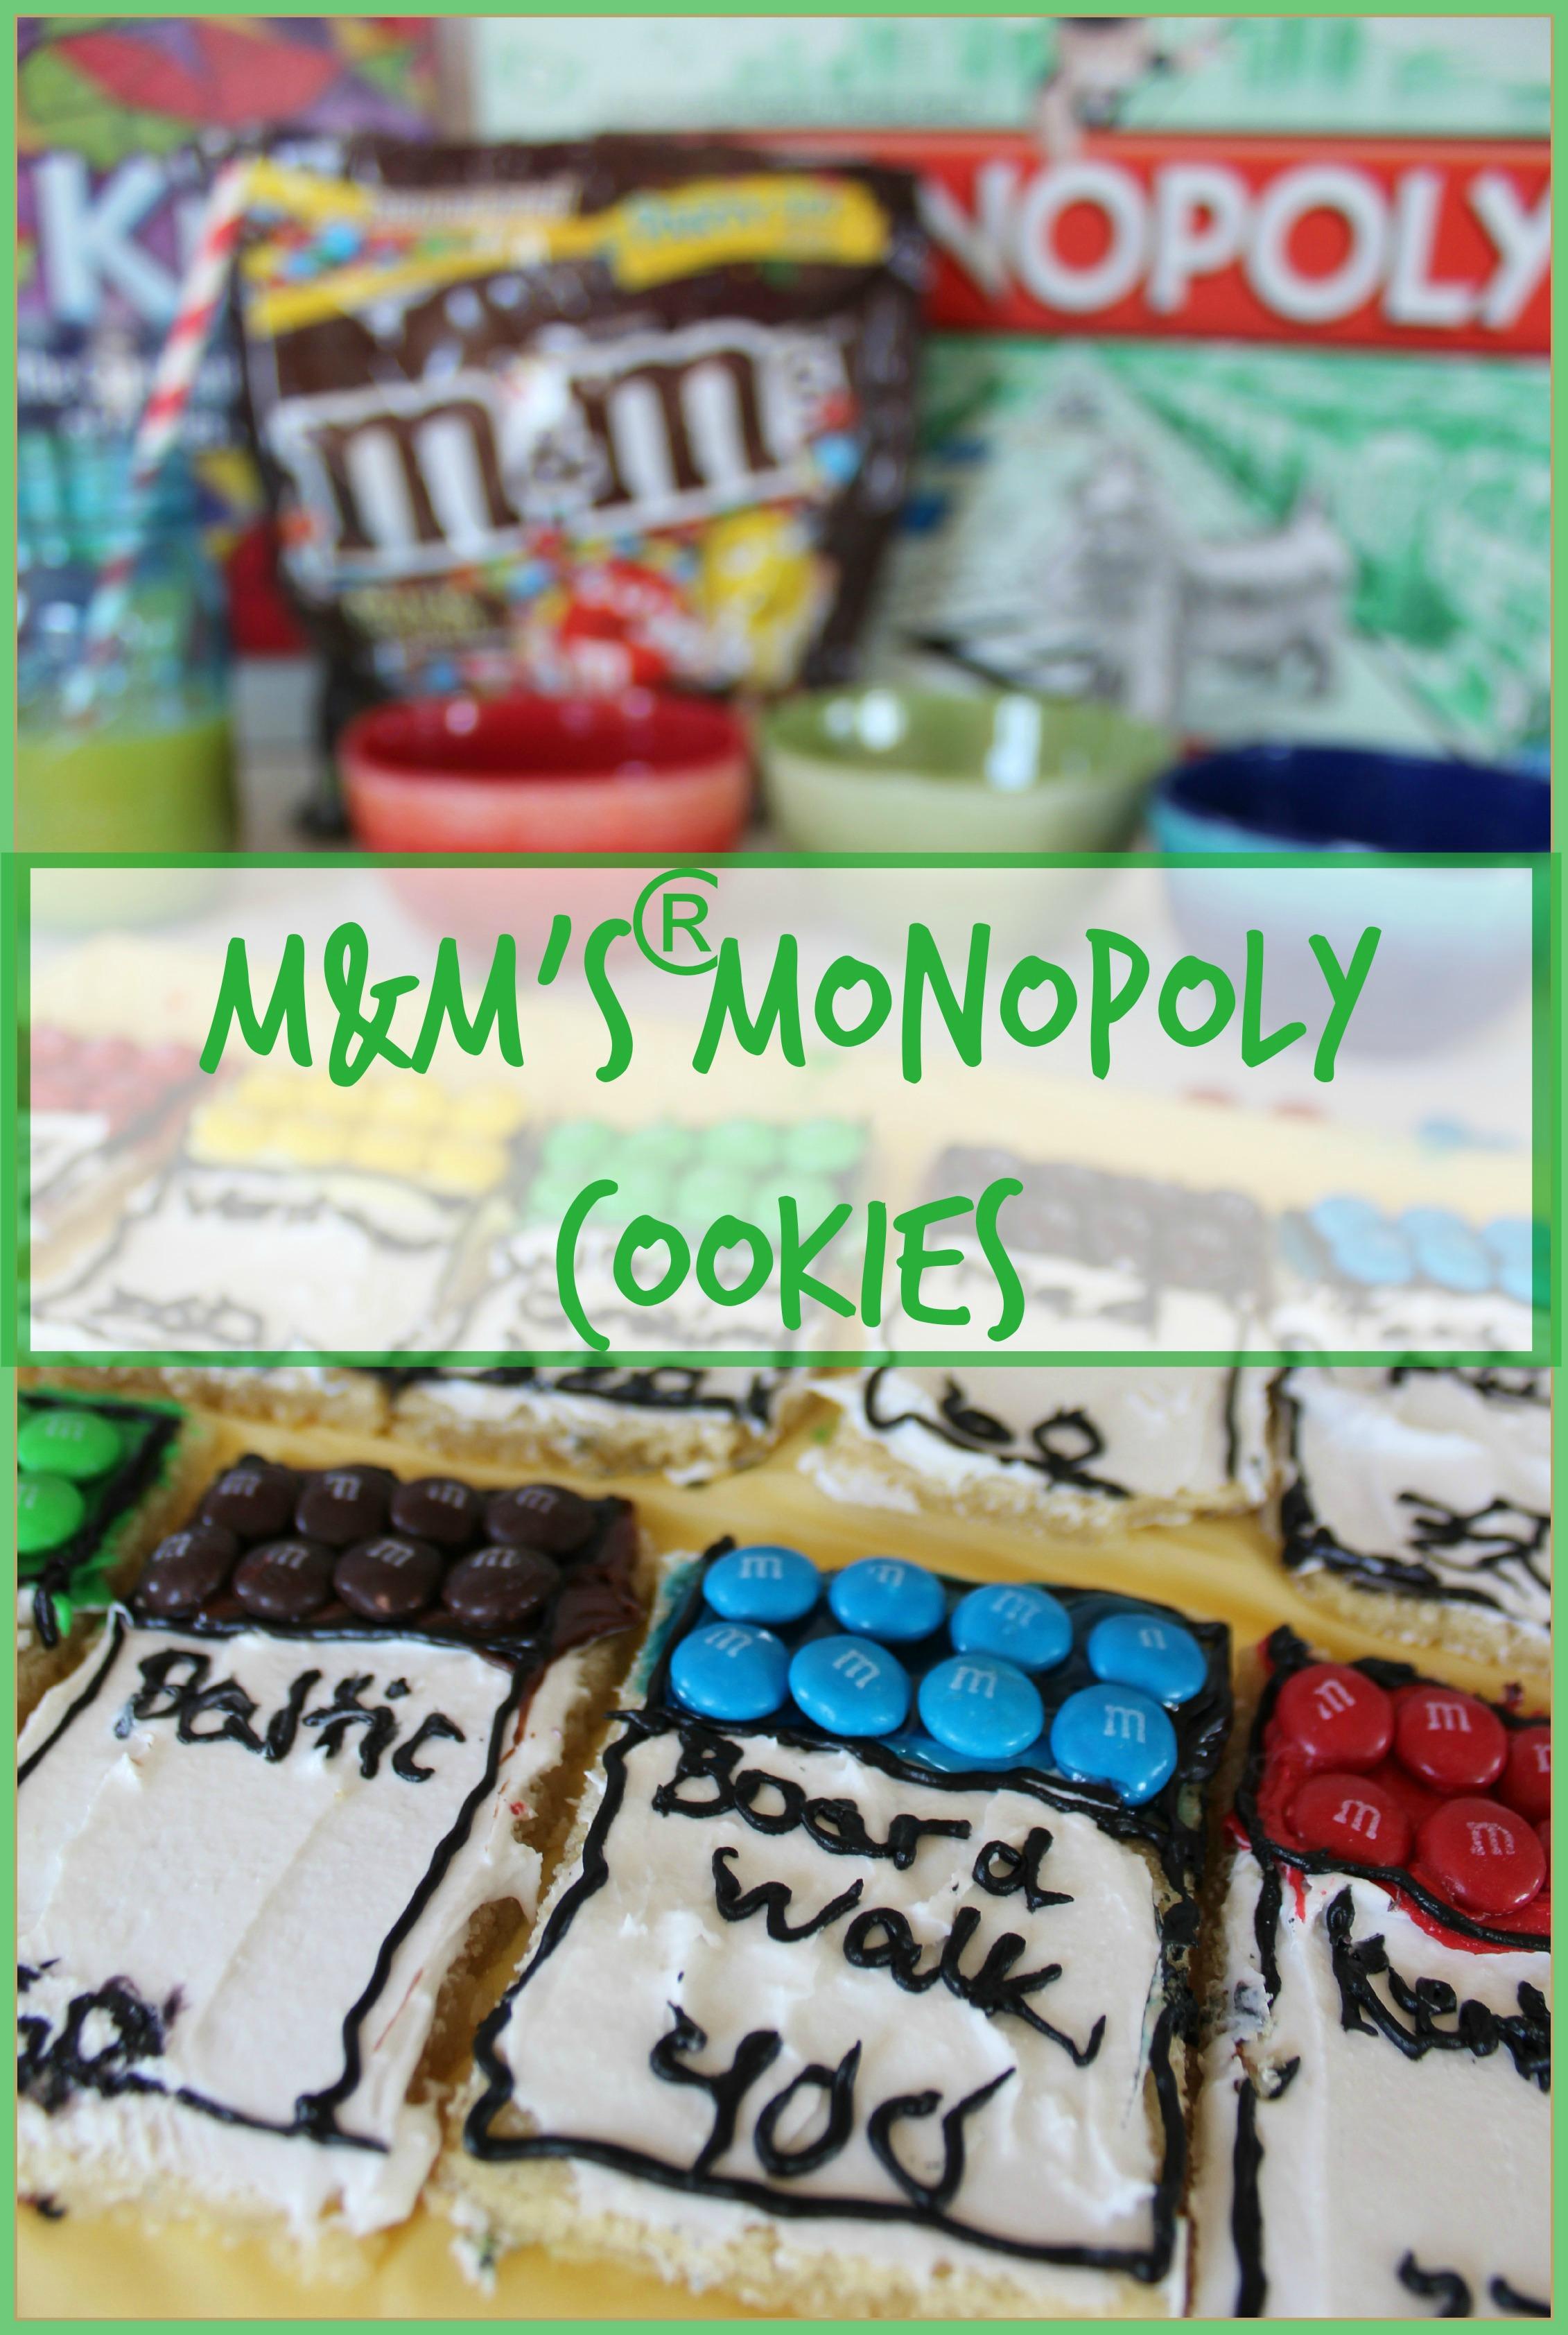 M&M's®  Monopoly Cookies